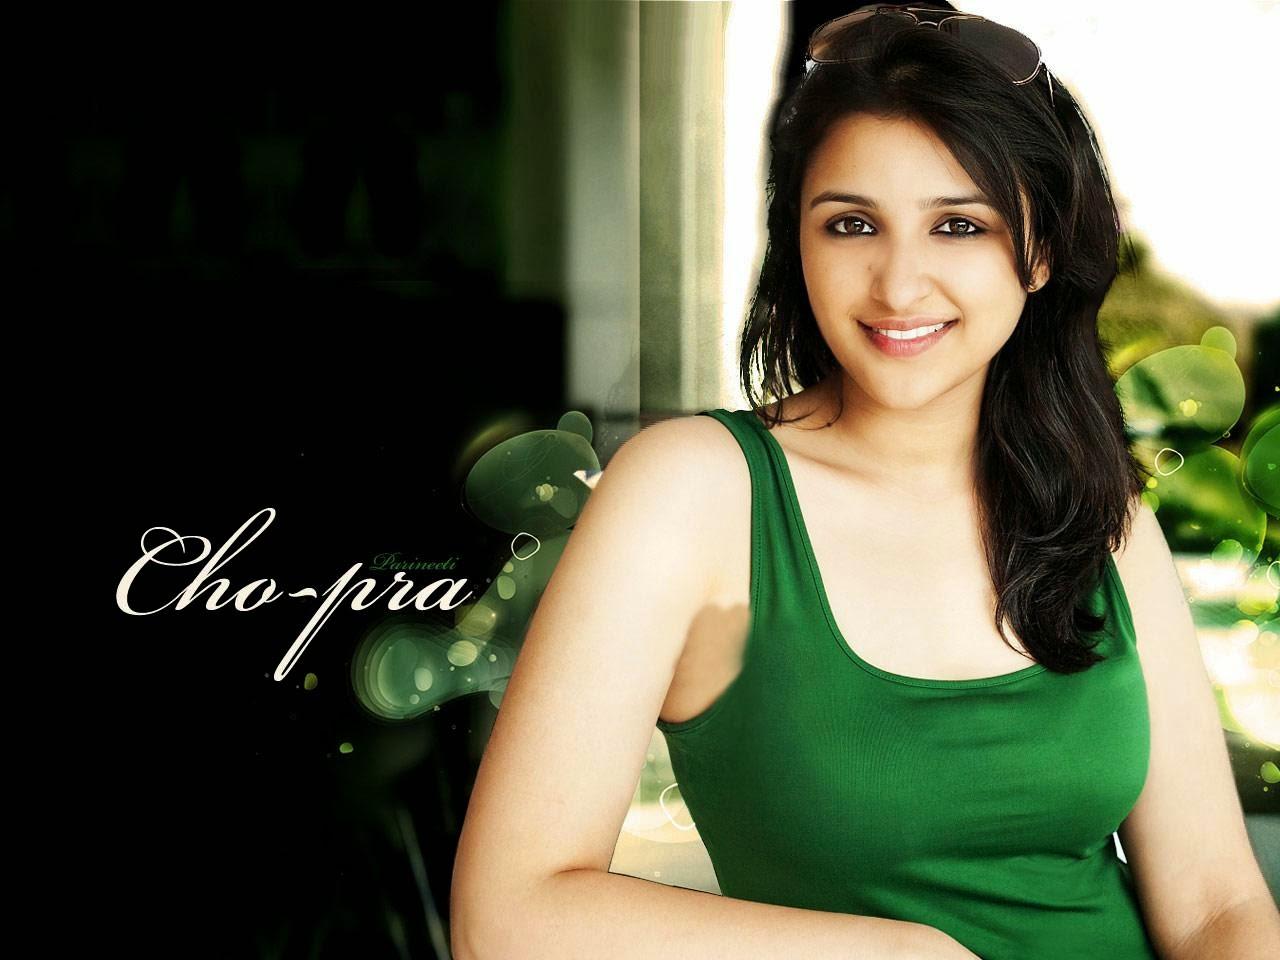 Parineeti Chopra Beautiful Hot And Sexy HD 1080p Wallpaper